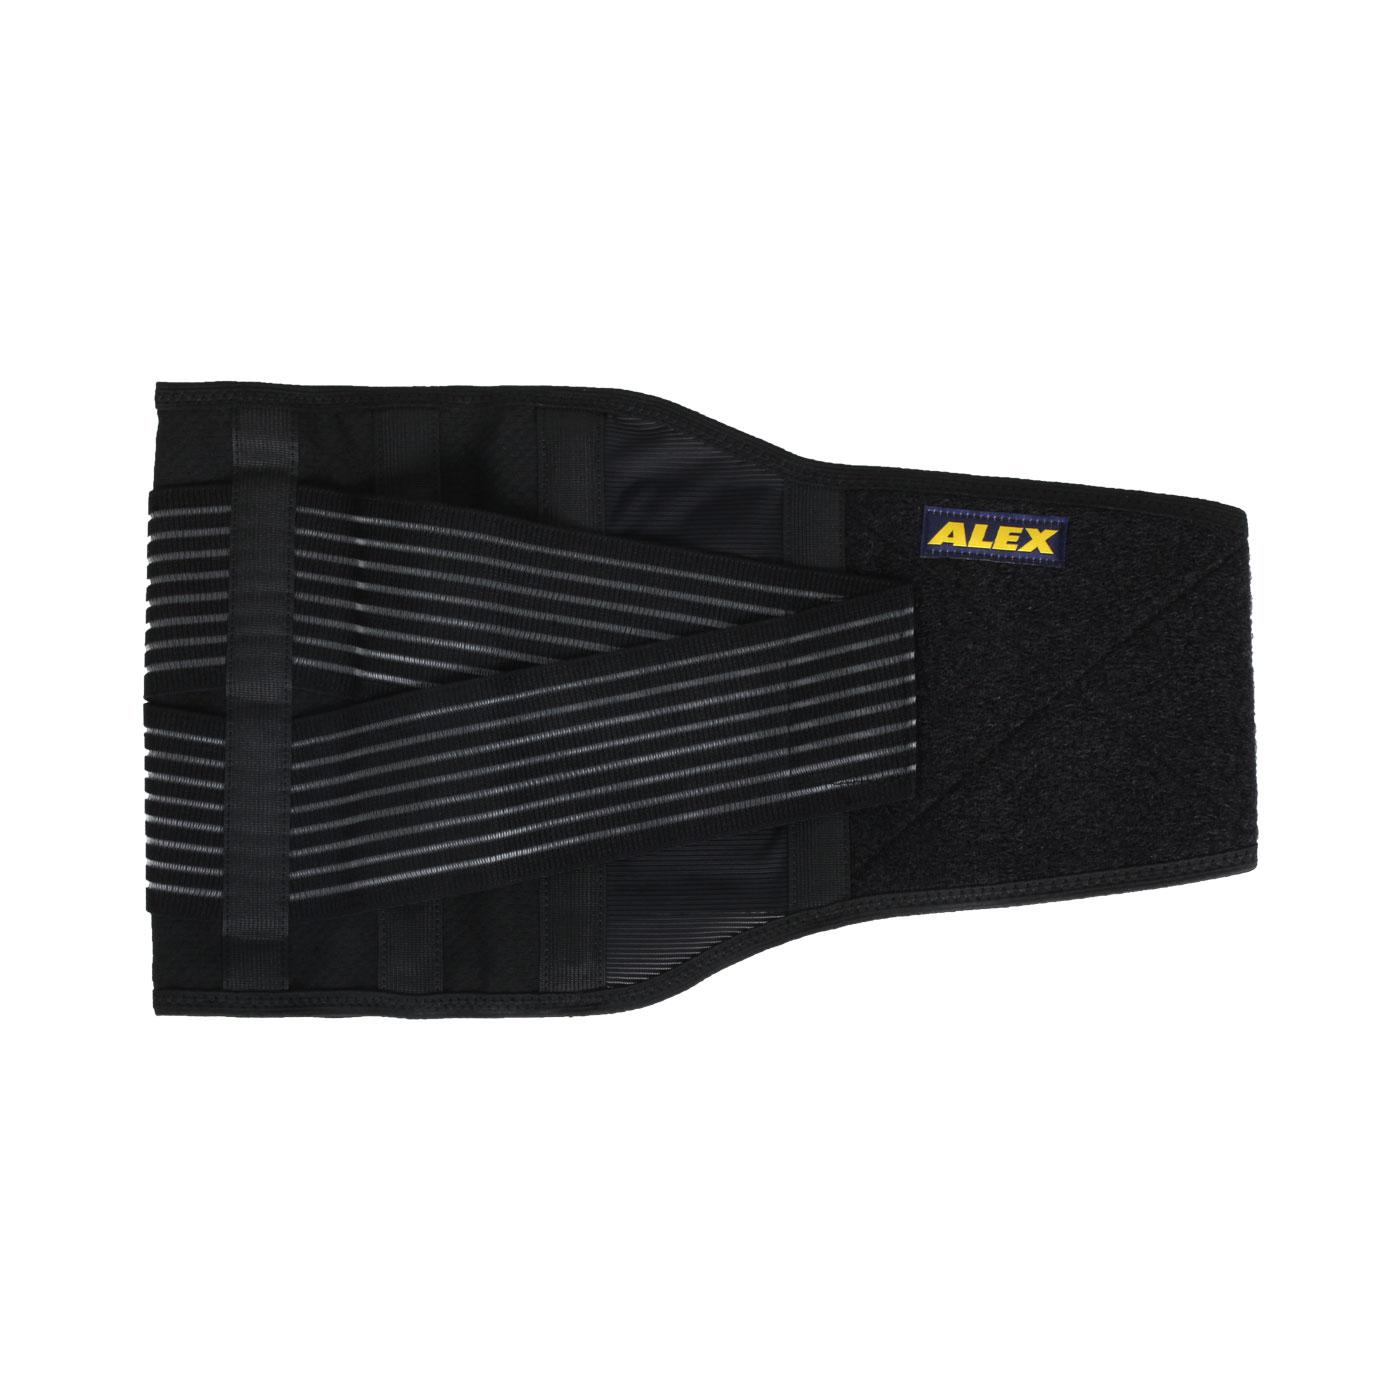 ALEX 纖薄型護腰 T-50 - 黑